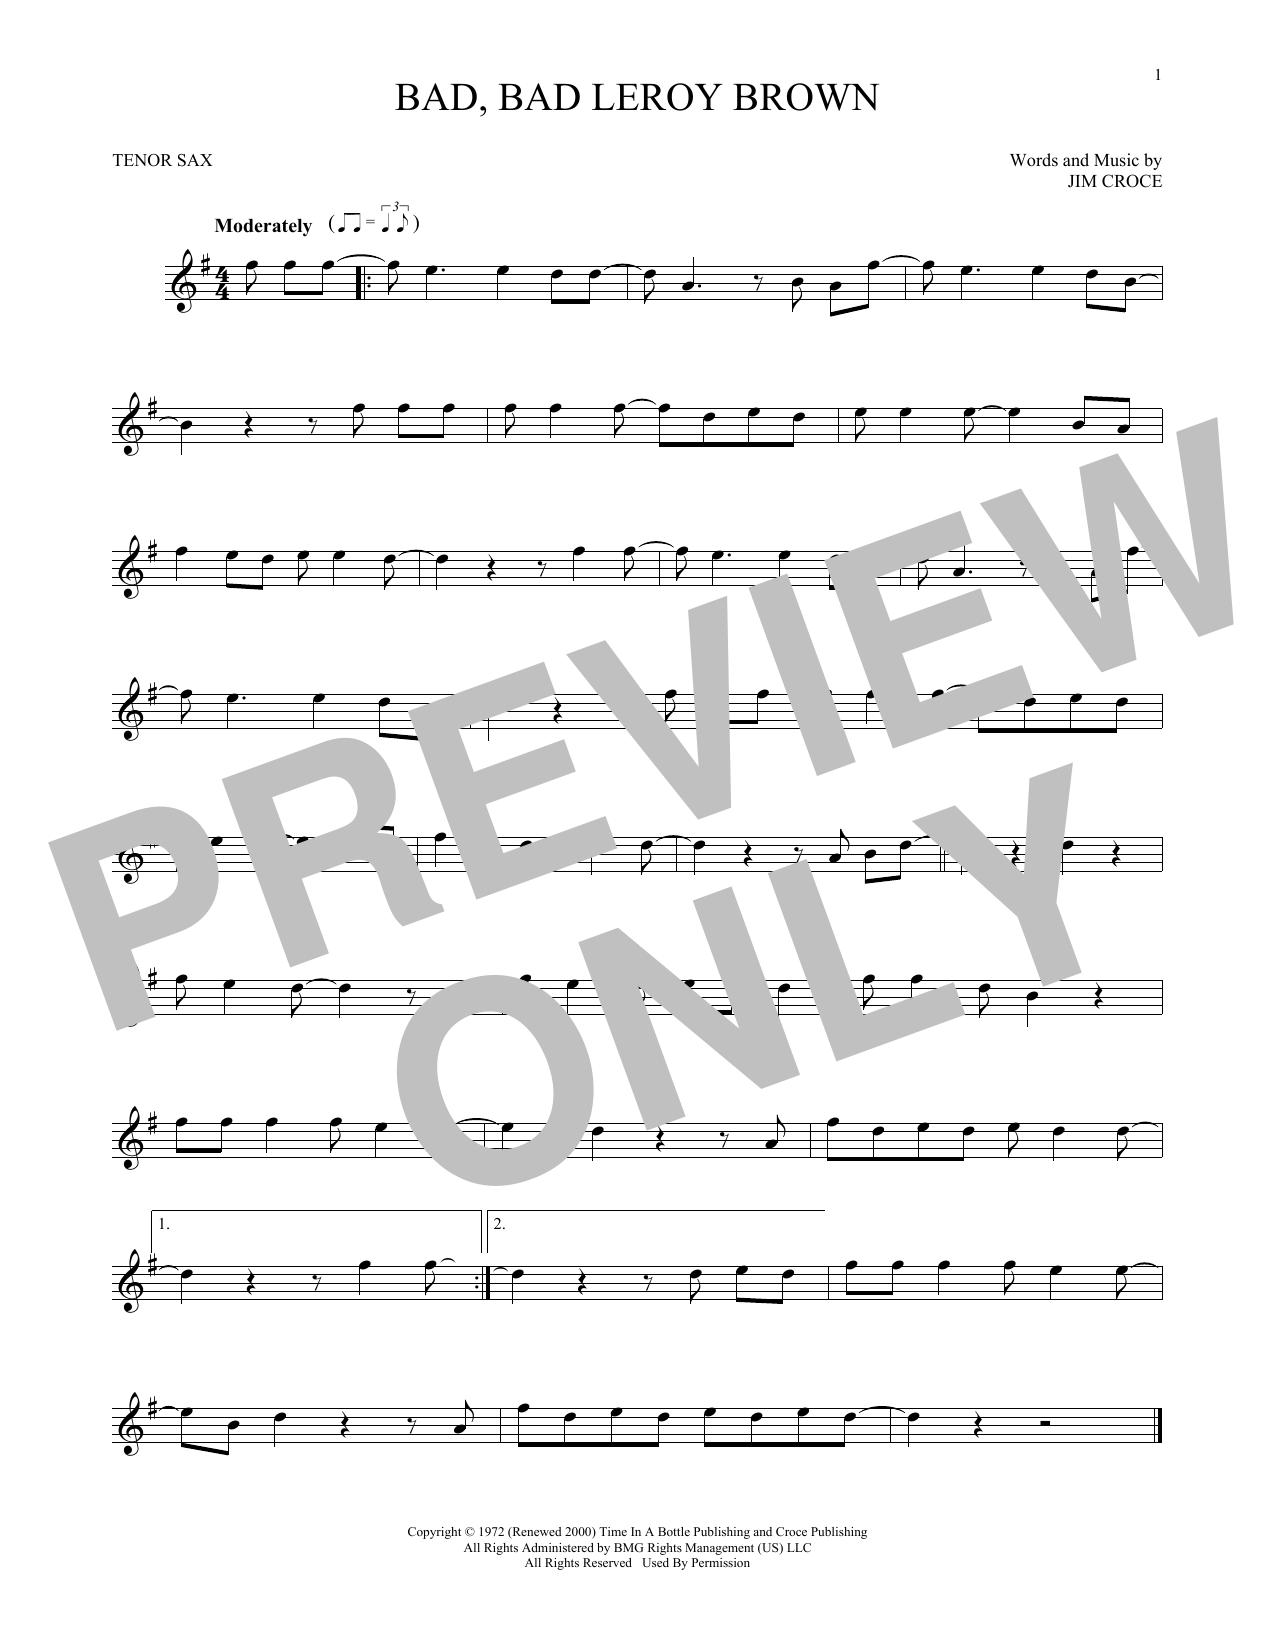 Bad, Bad Leroy Brown (Tenor Sax Solo)